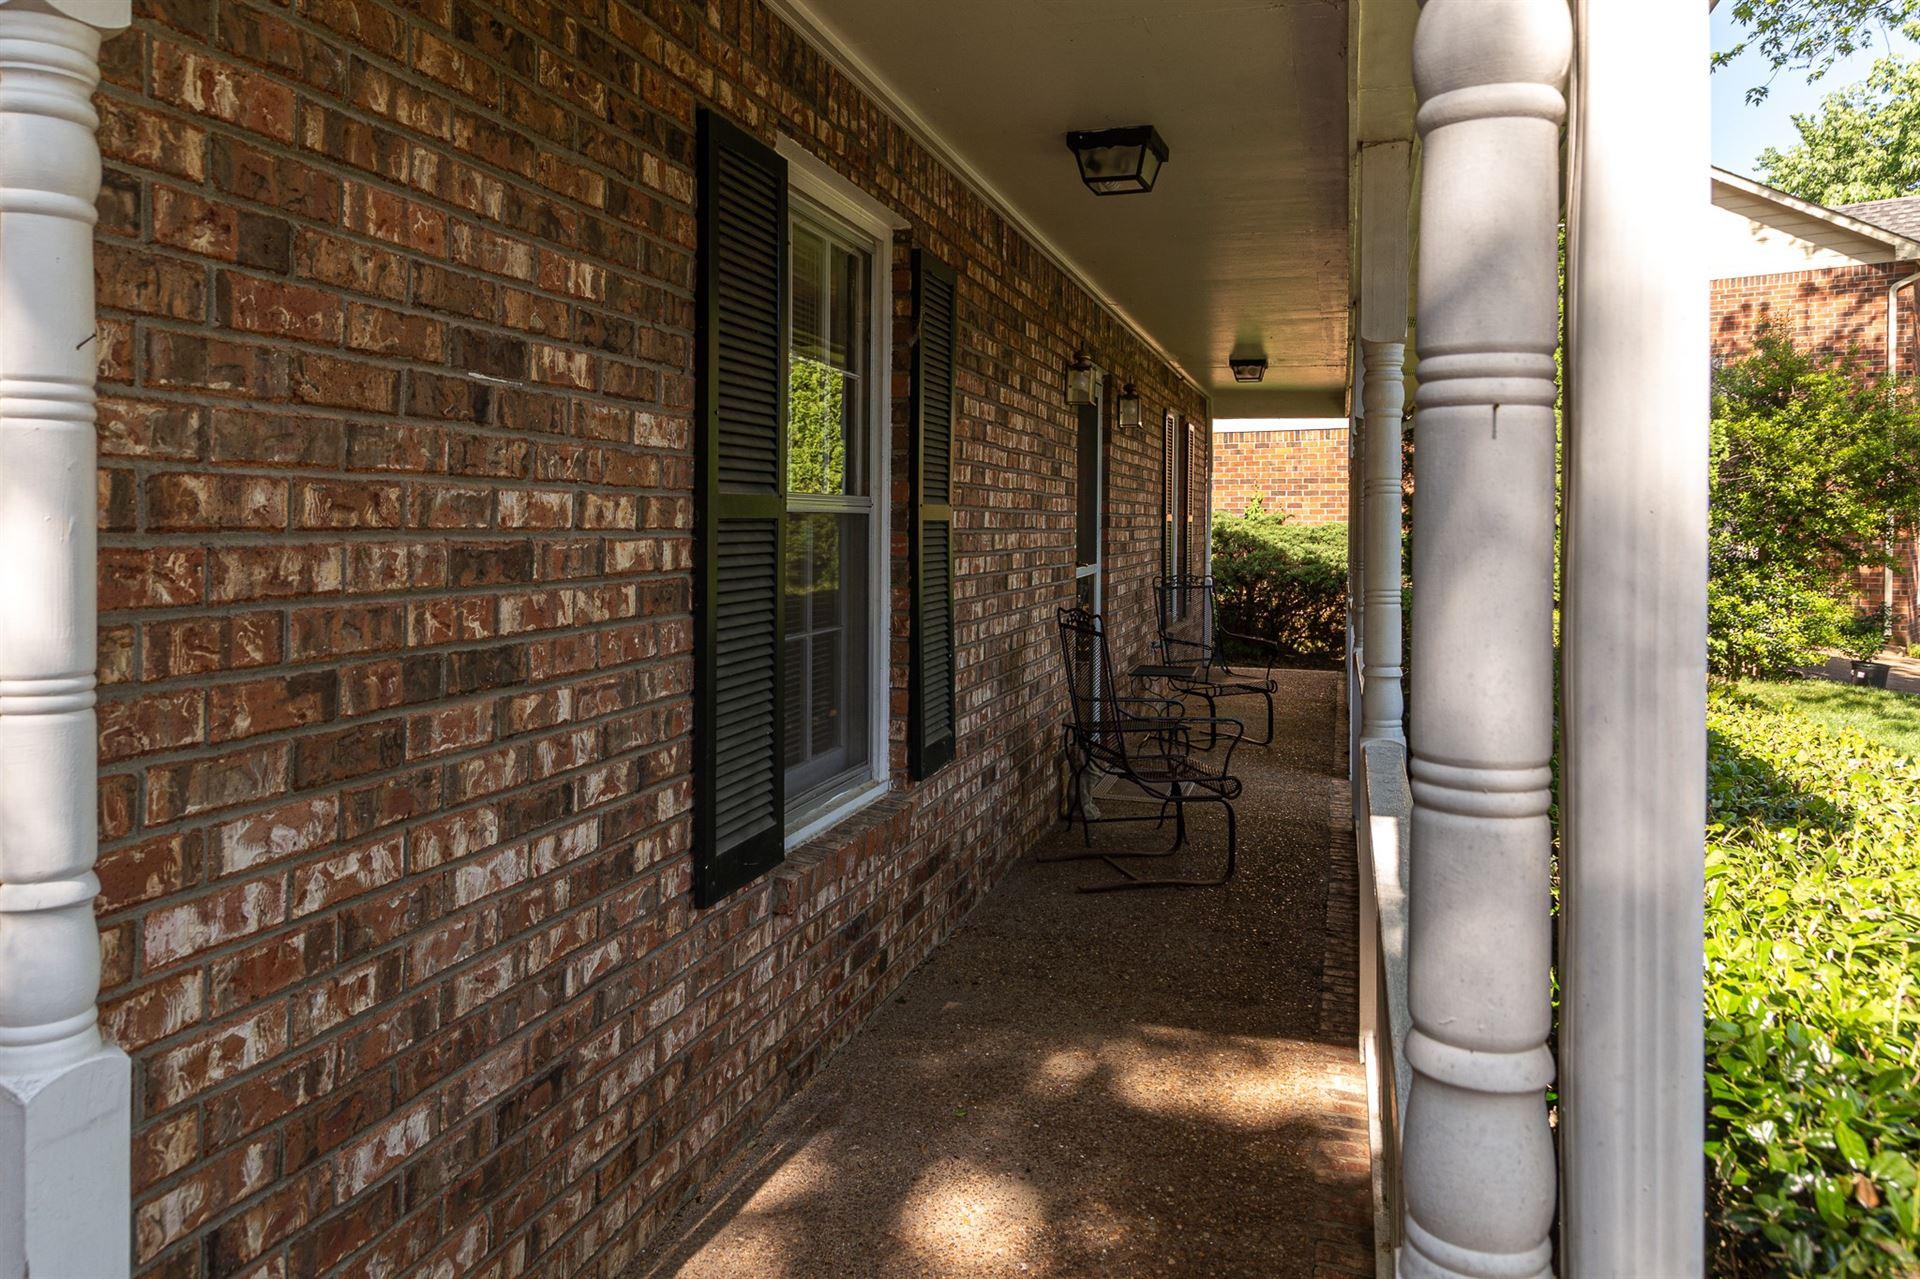 Photo of 508 Maplegrove Ct, Franklin, TN 37064 (MLS # 2251987)